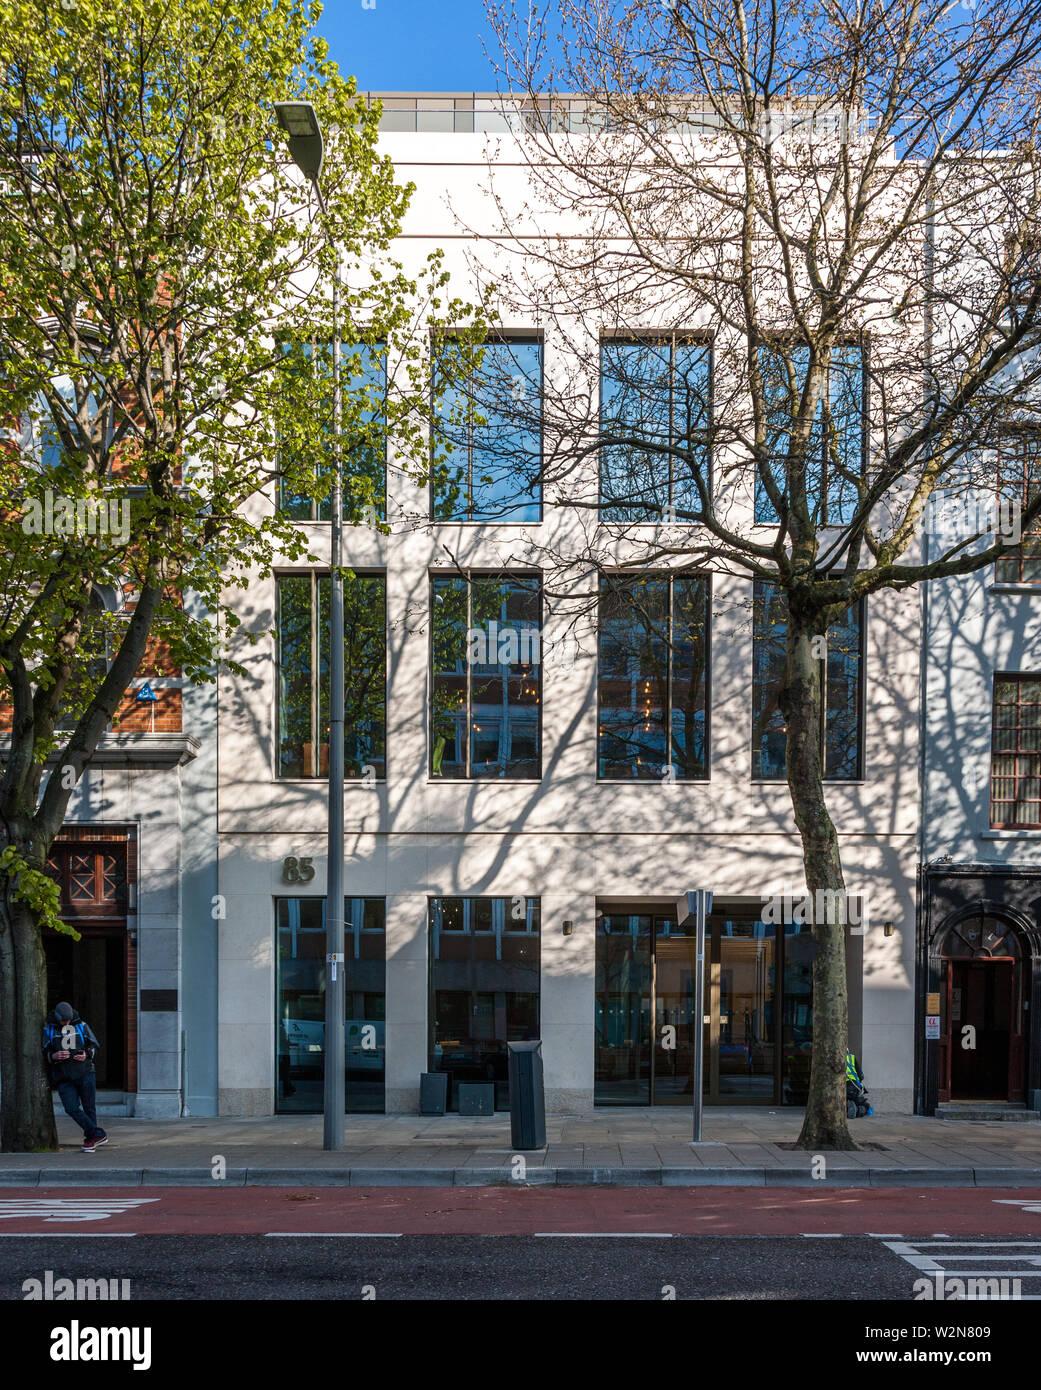 Cork City, Cork, Ireland. 05th April, 2019. A section of the facade of 85 South Mall, Cork, Ireland. - Stock Image